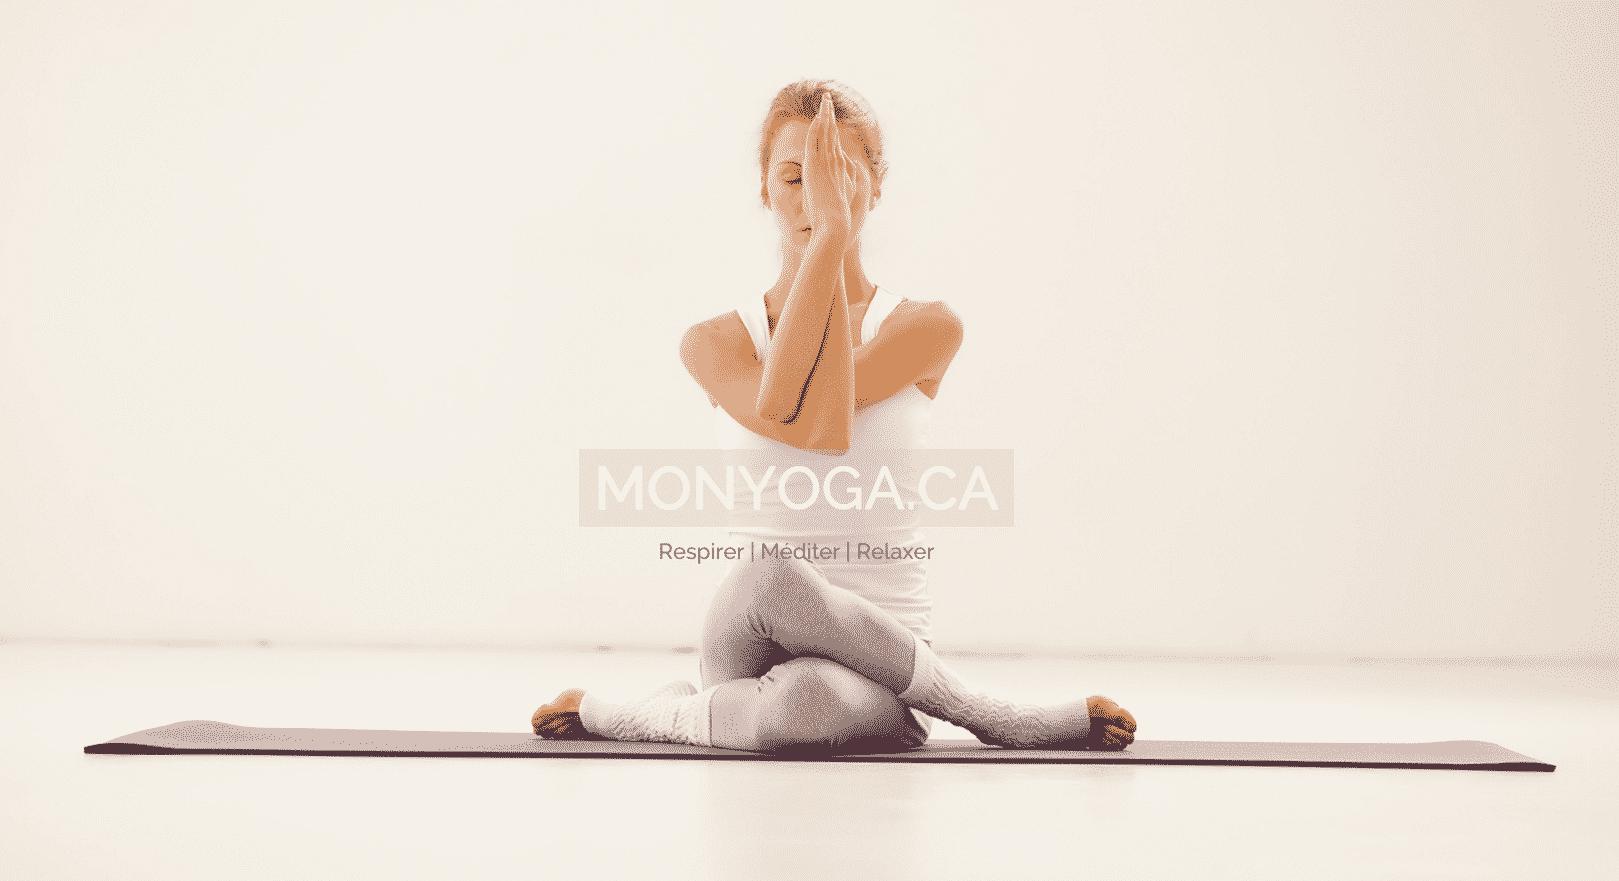 monyoga.ca